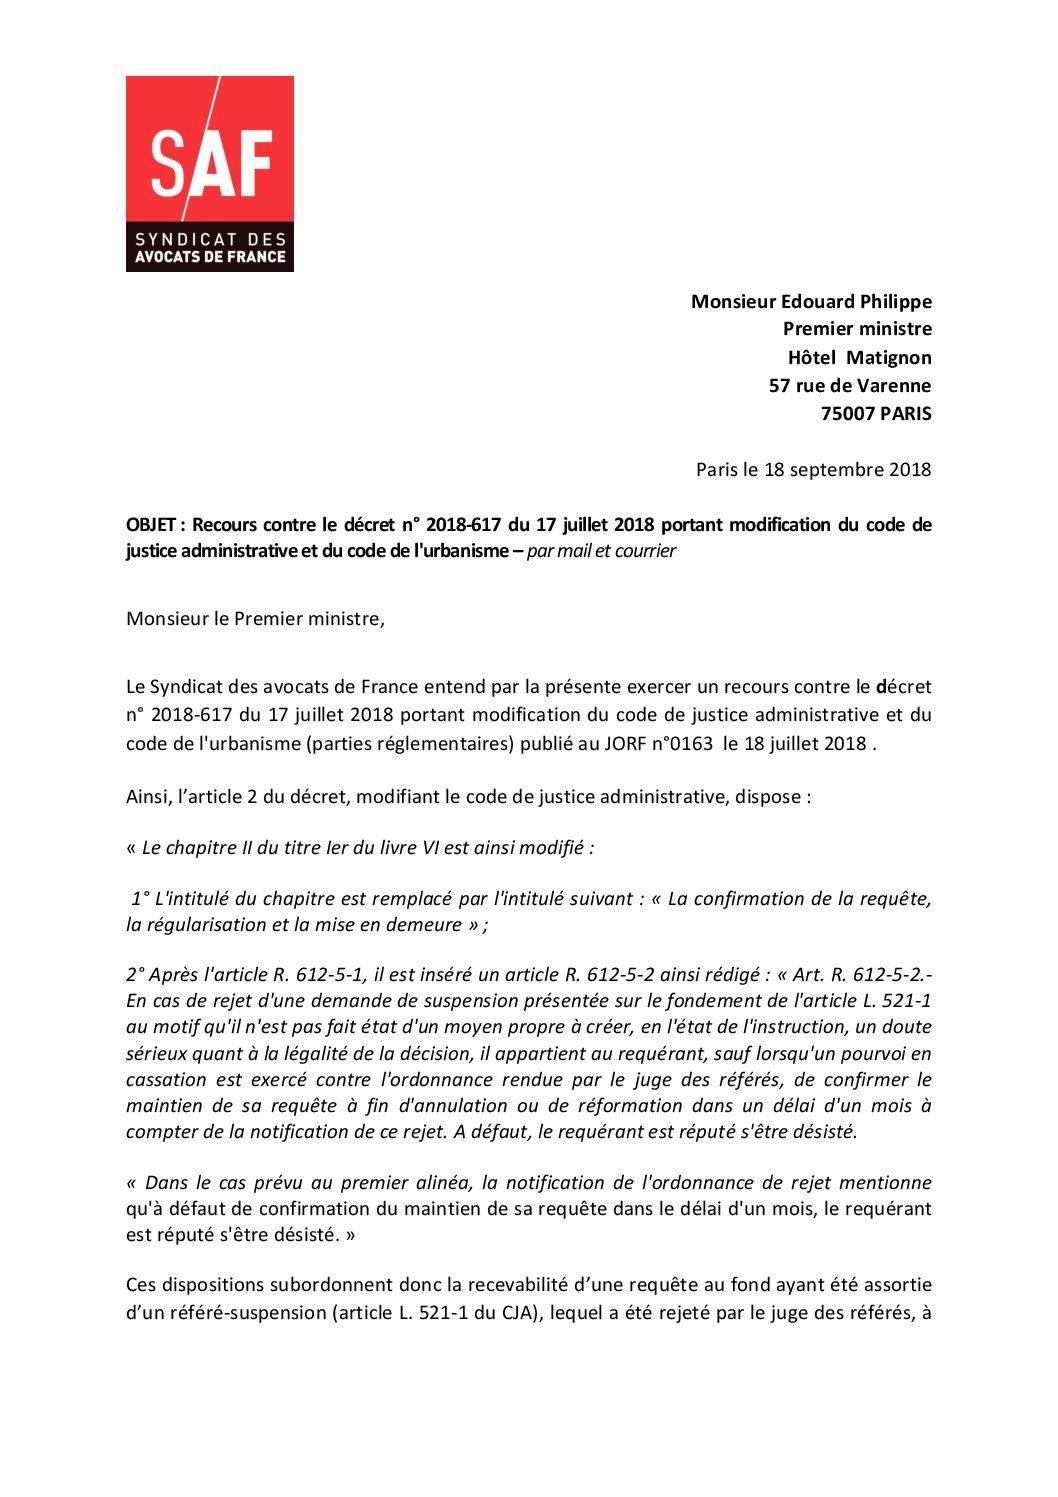 modele lettre invitation officielle ministre